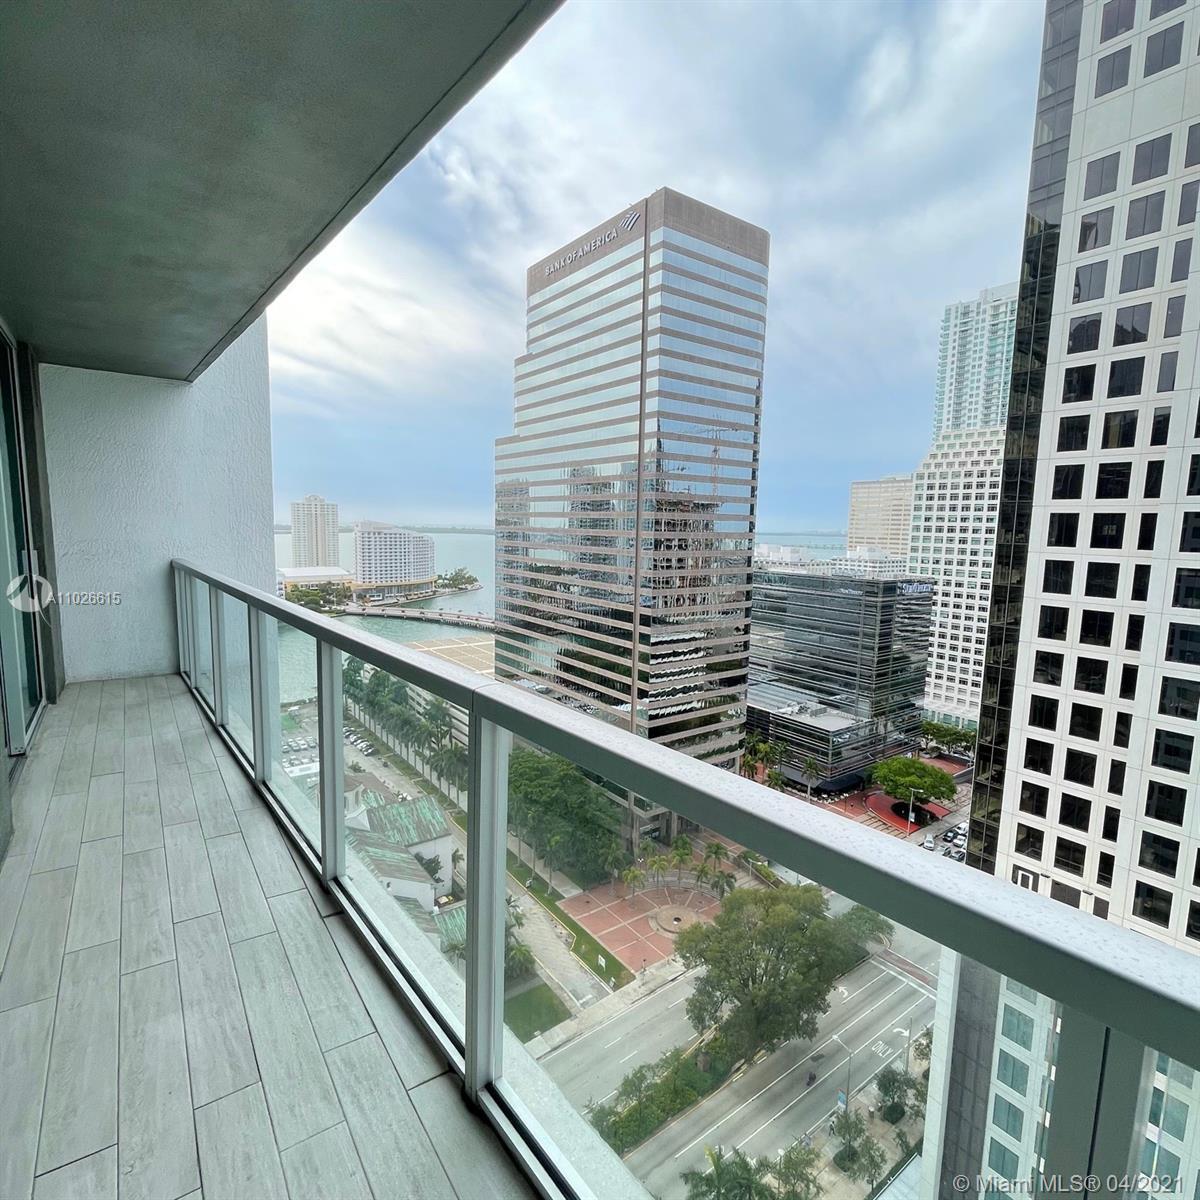 500 Brickell West Tower #2506 - 500 Brickell Ave #2506, Miami, FL 33131